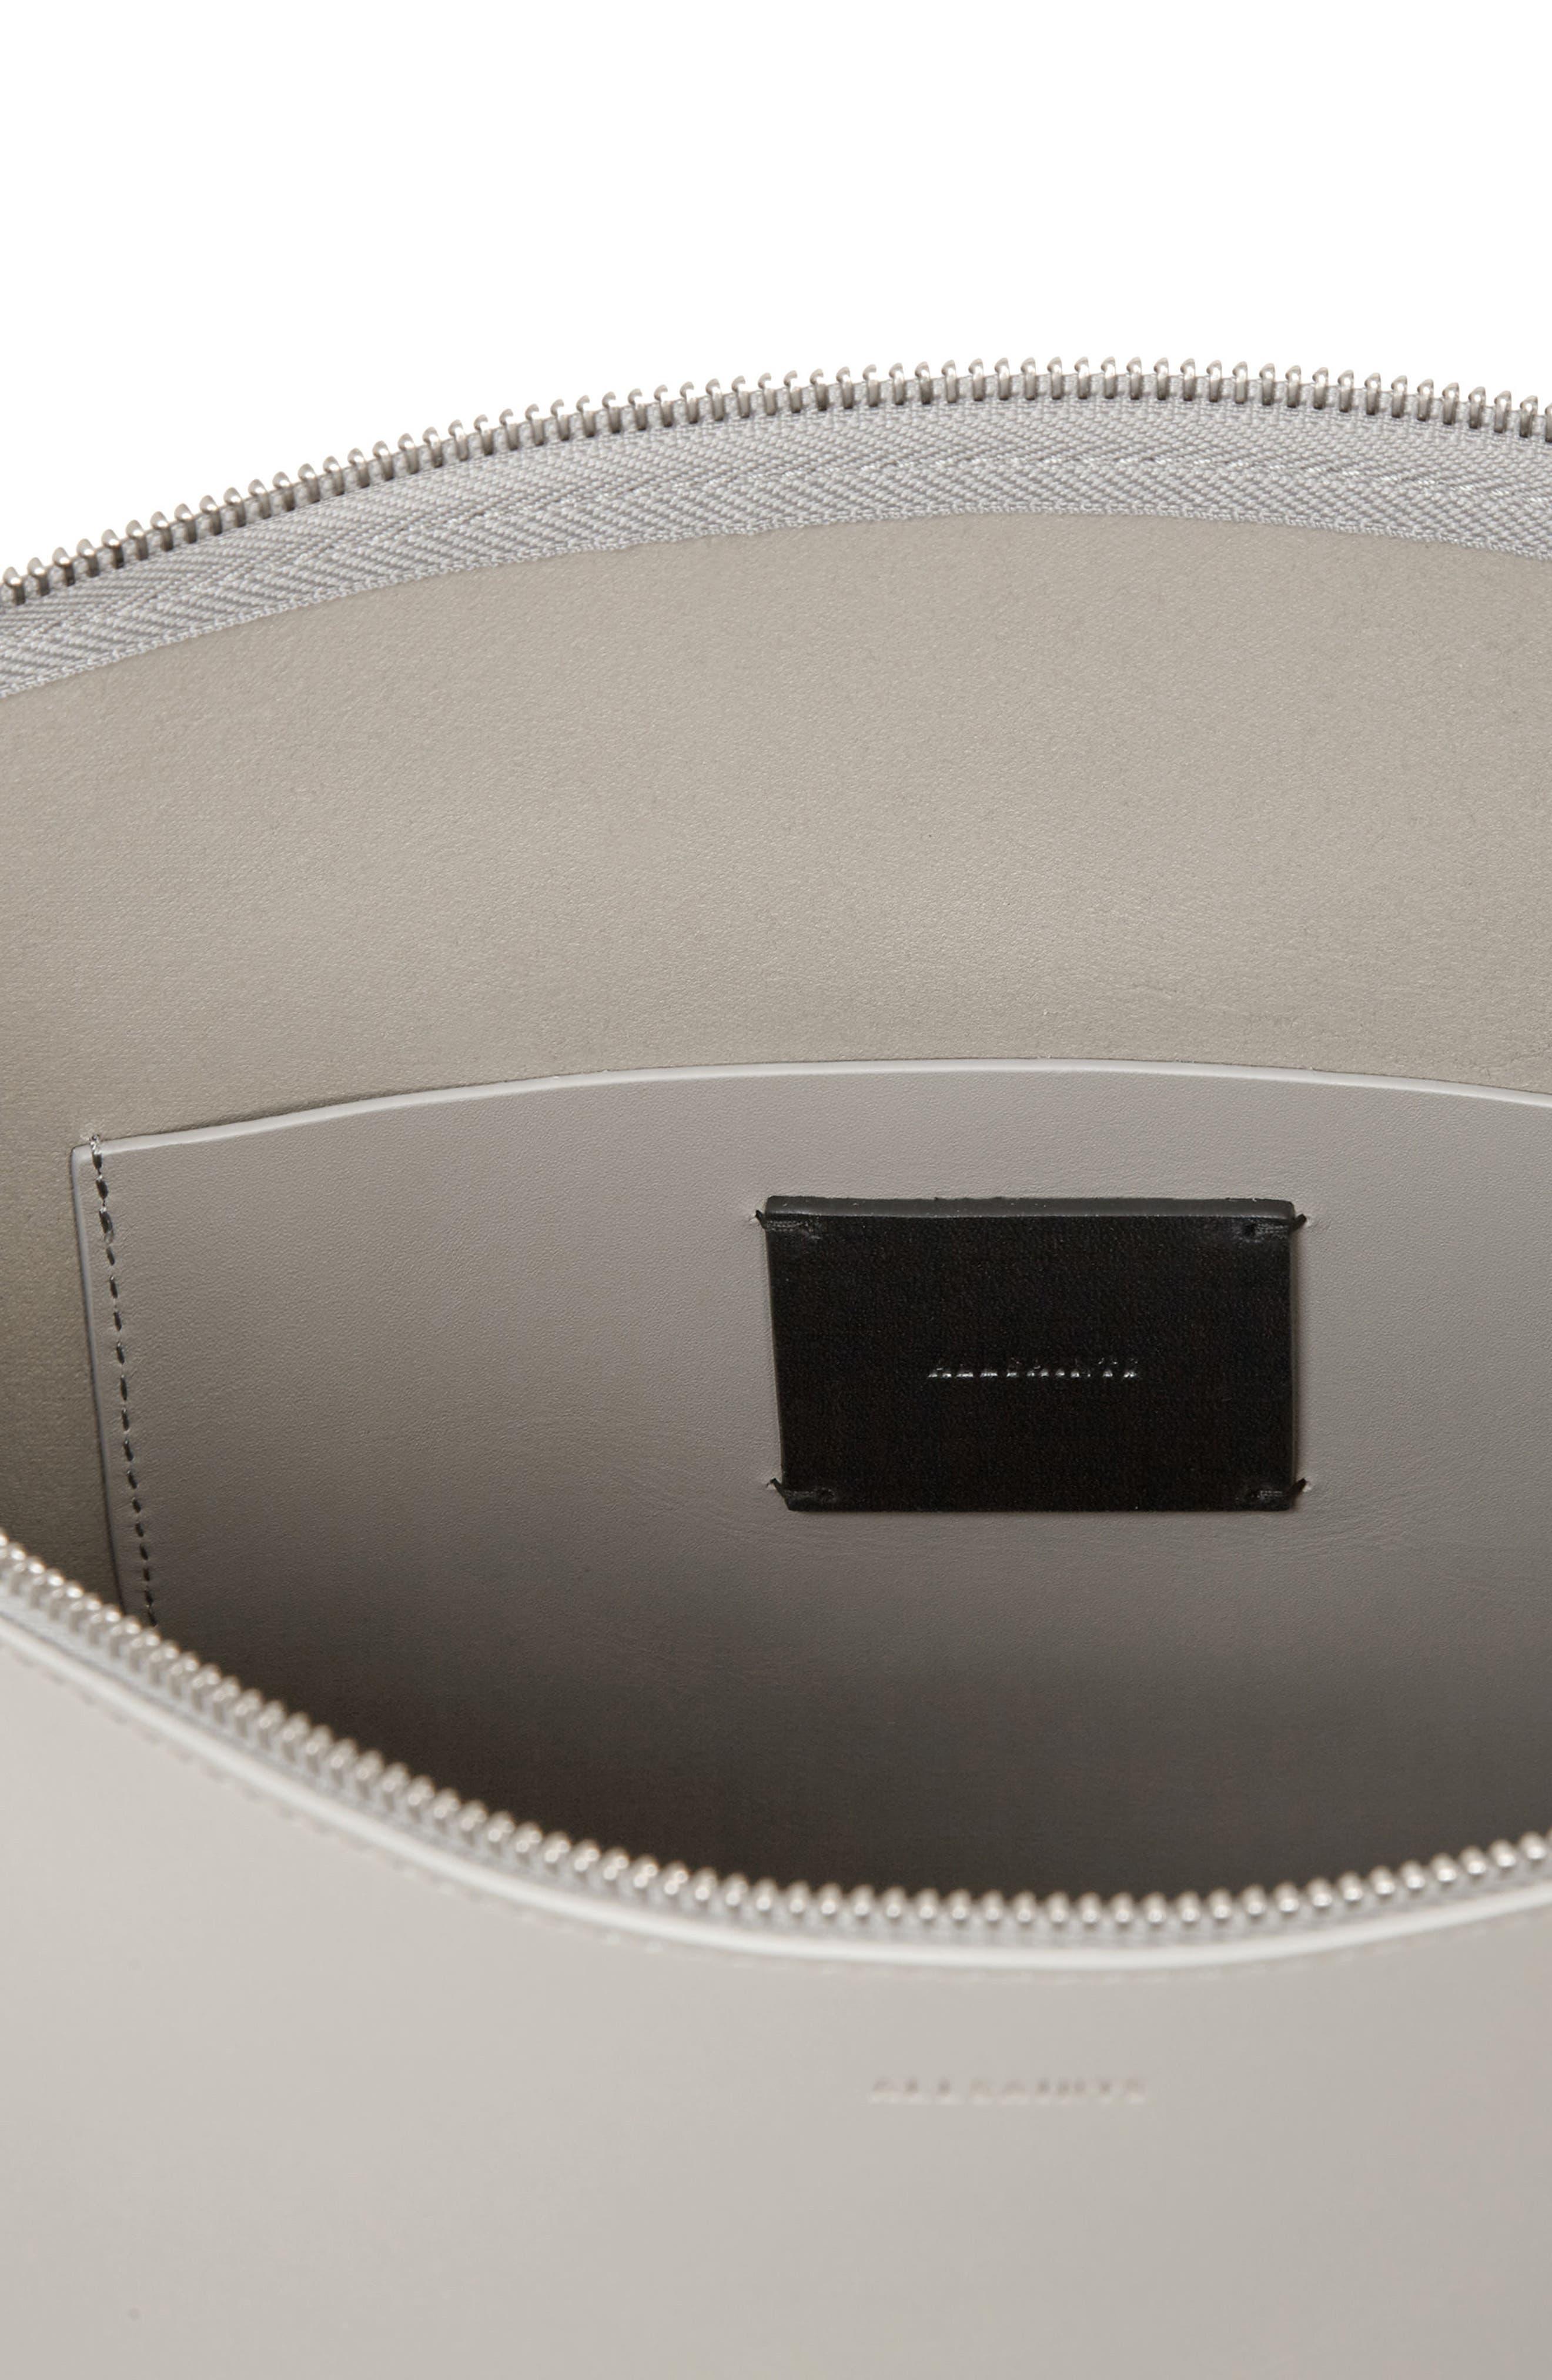 Kita Leather Shoulder/Crossbody Bag,                             Alternate thumbnail 2, color,                             052